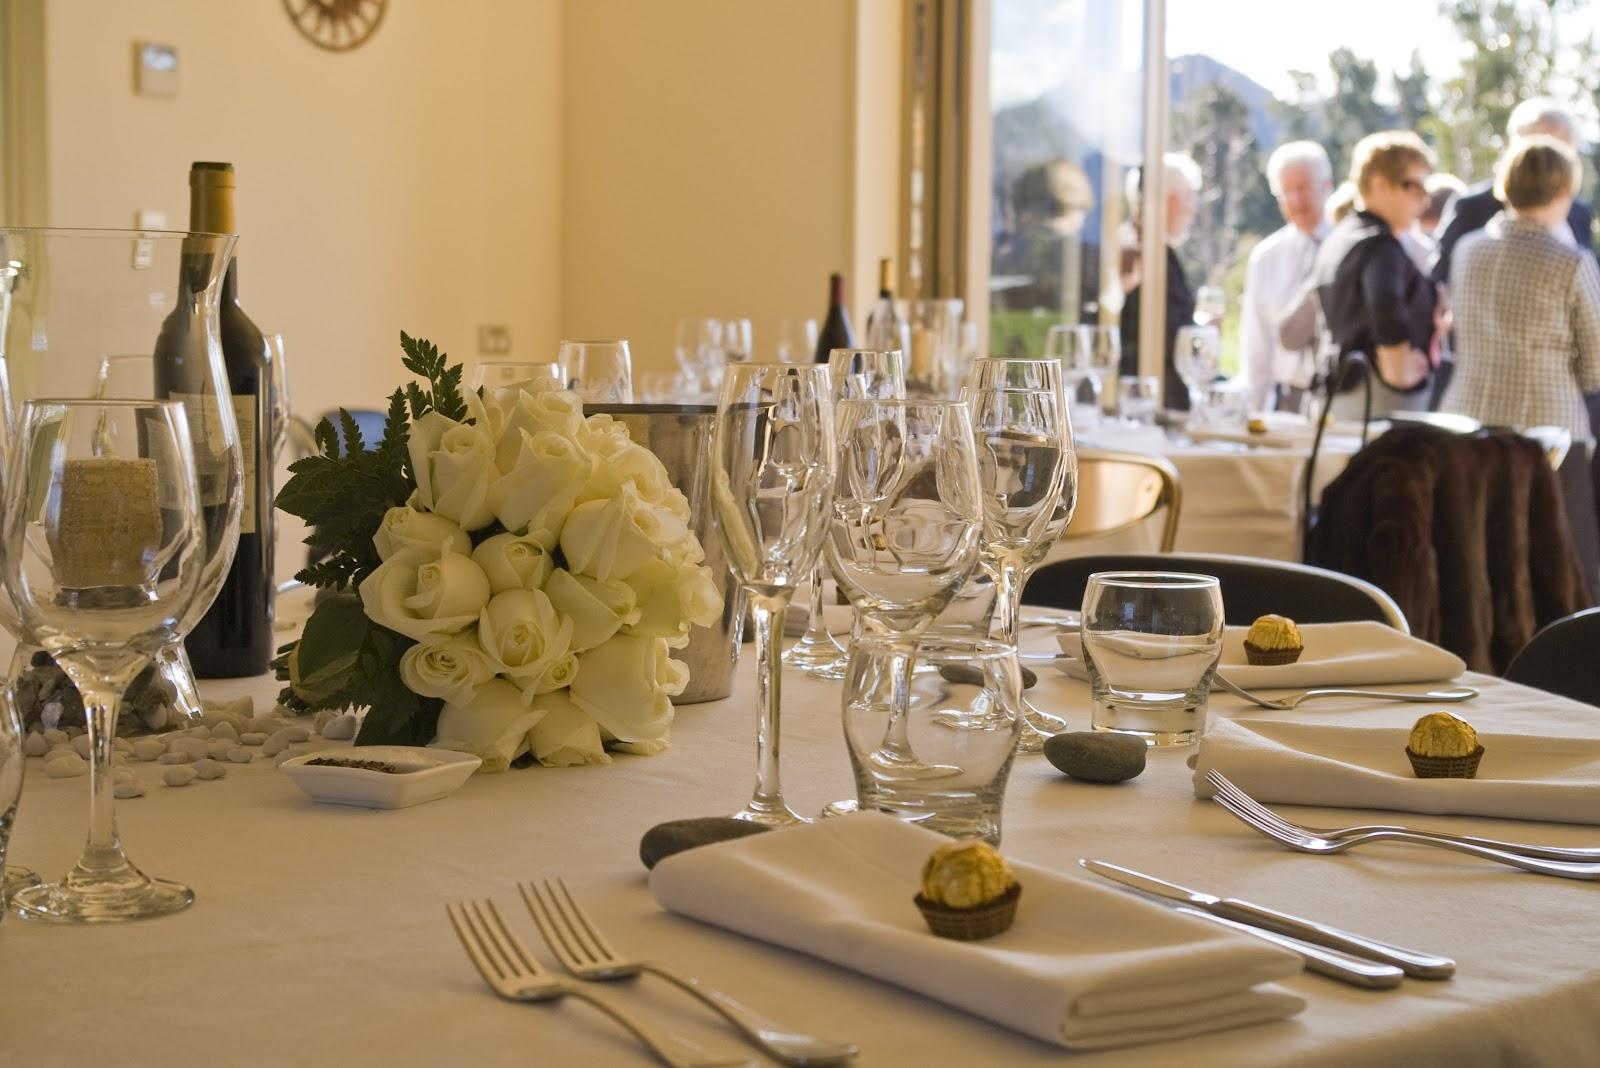 Table setting ideas, wedding table setting ideas